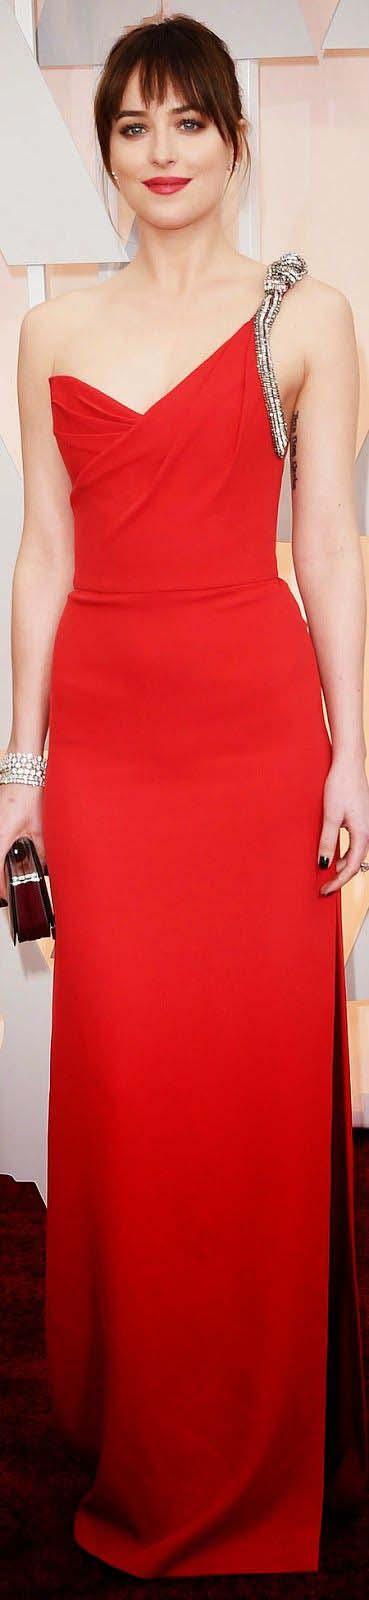 Dakota Johnson in Saint Laurent Dress, Belly Bag and Mark Diamonds Jewelry